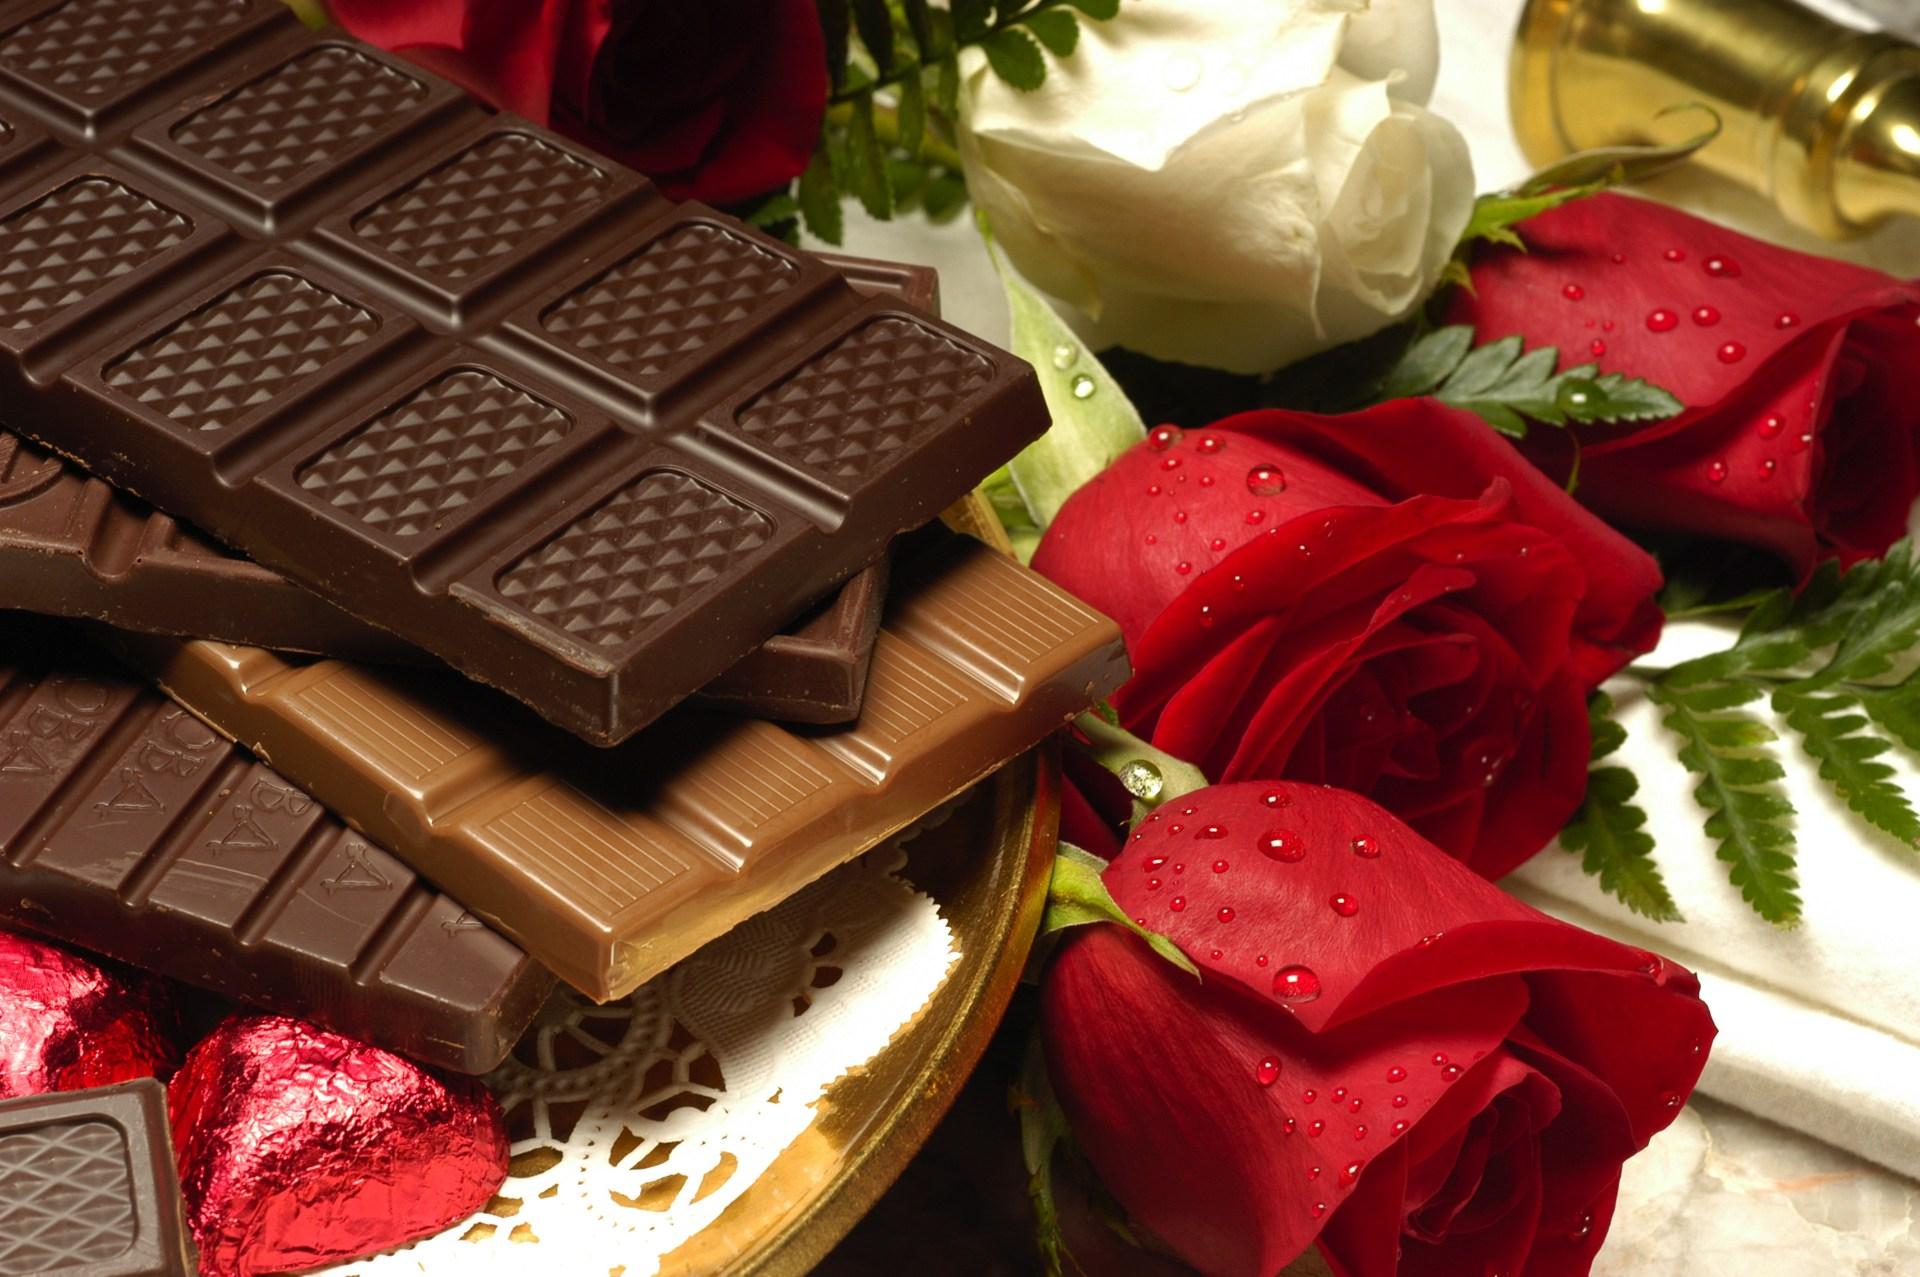 hinh nen chocolate 23